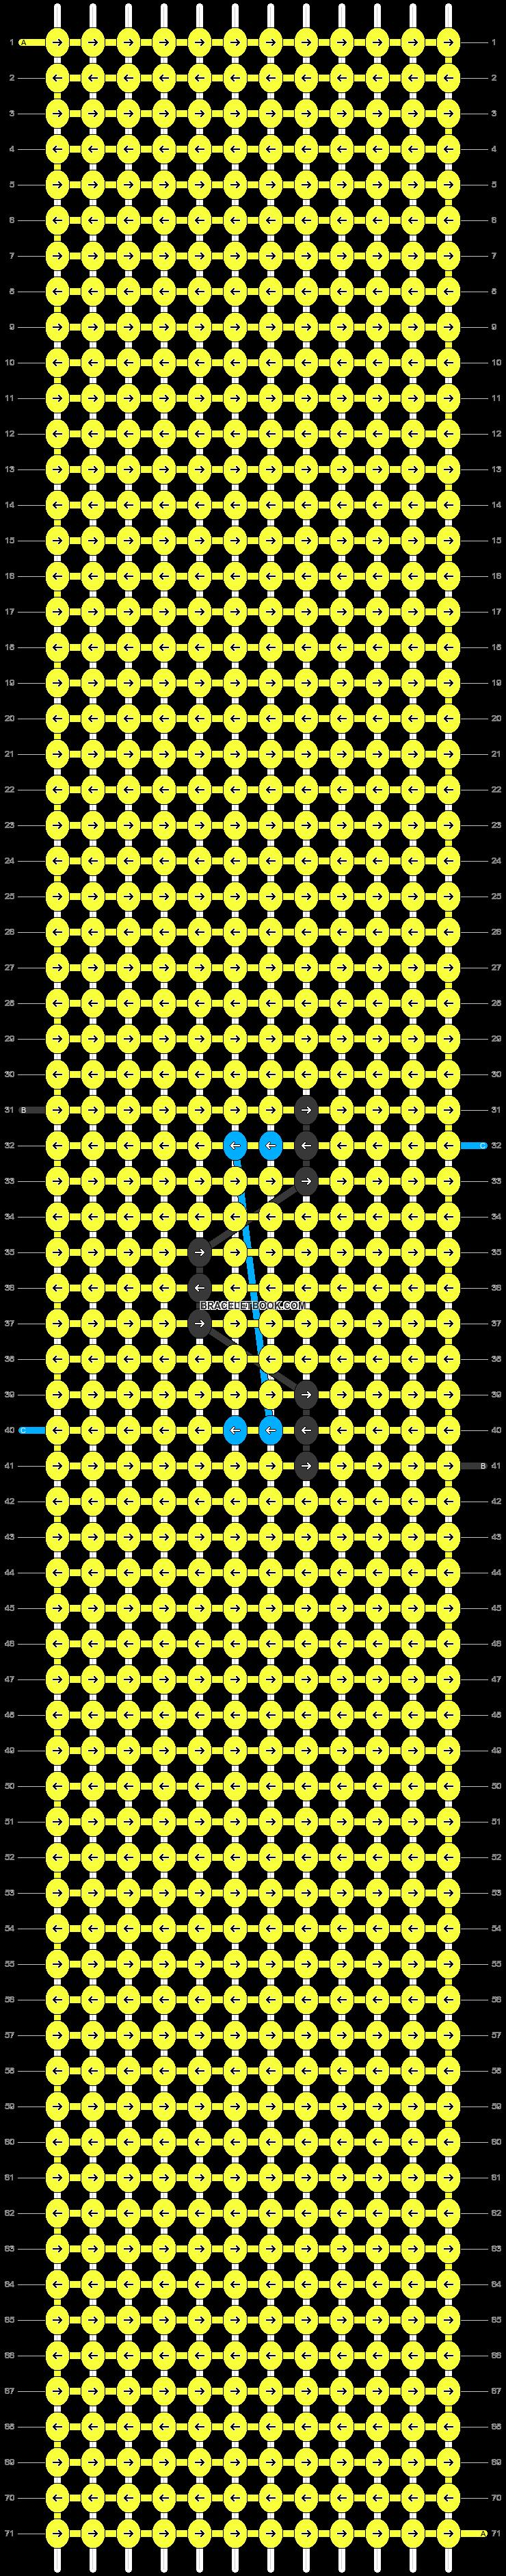 Alpha pattern #45646 pattern